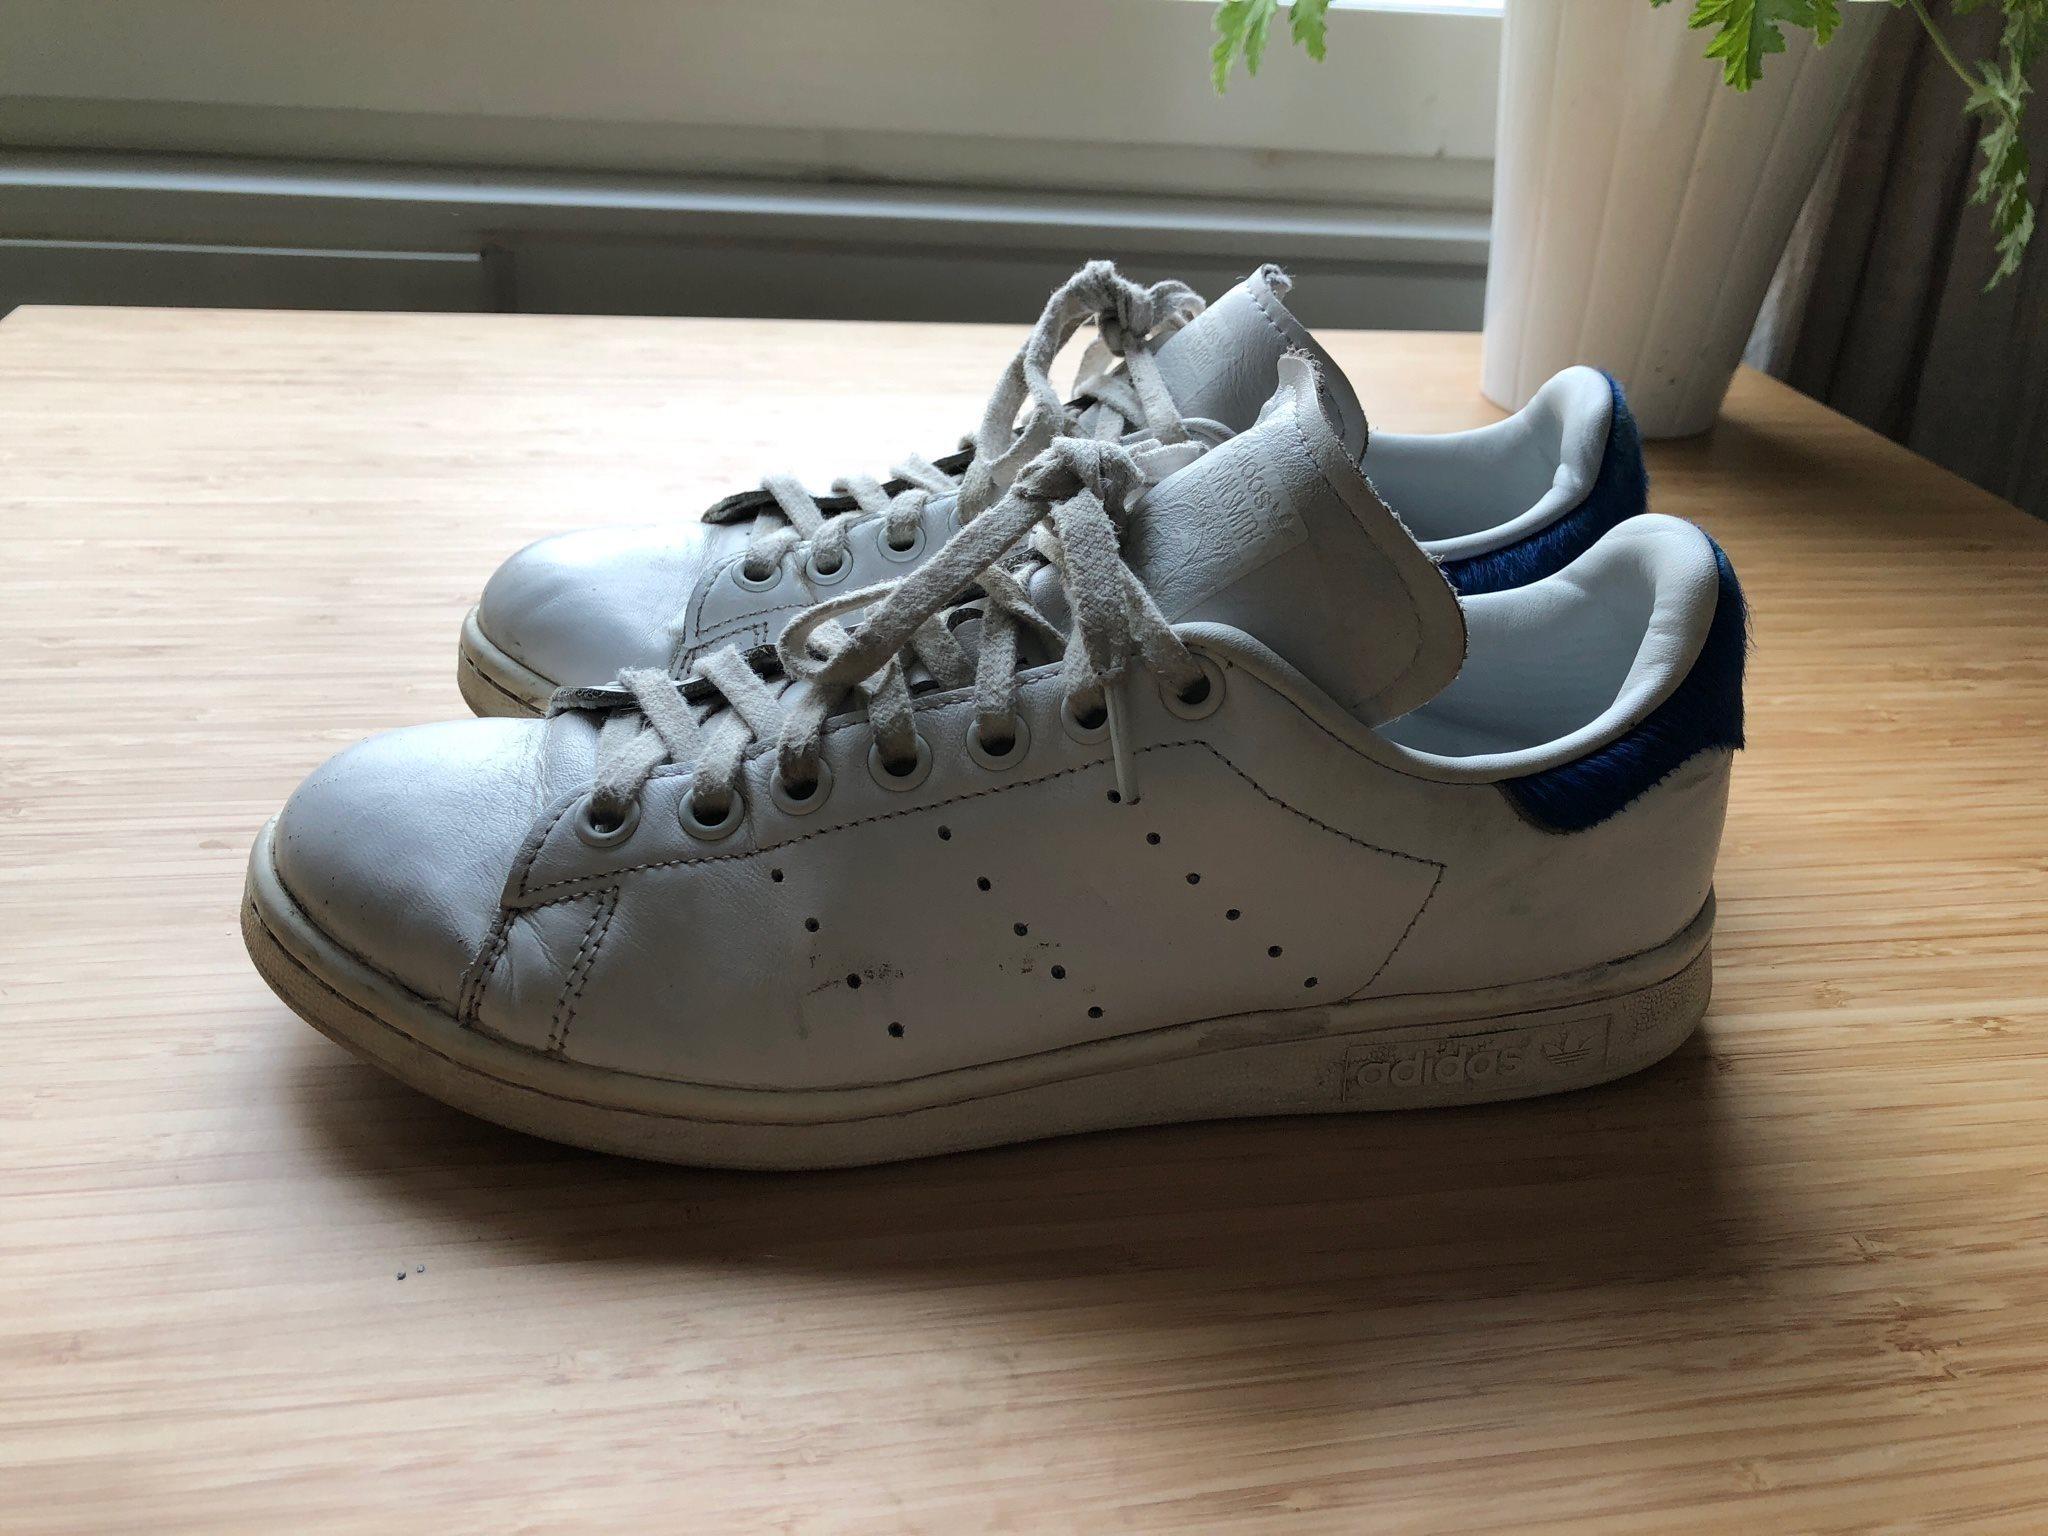 san francisco c8810 f9ab2 Adidas stan smith sneakers skor 39 1 3 rare